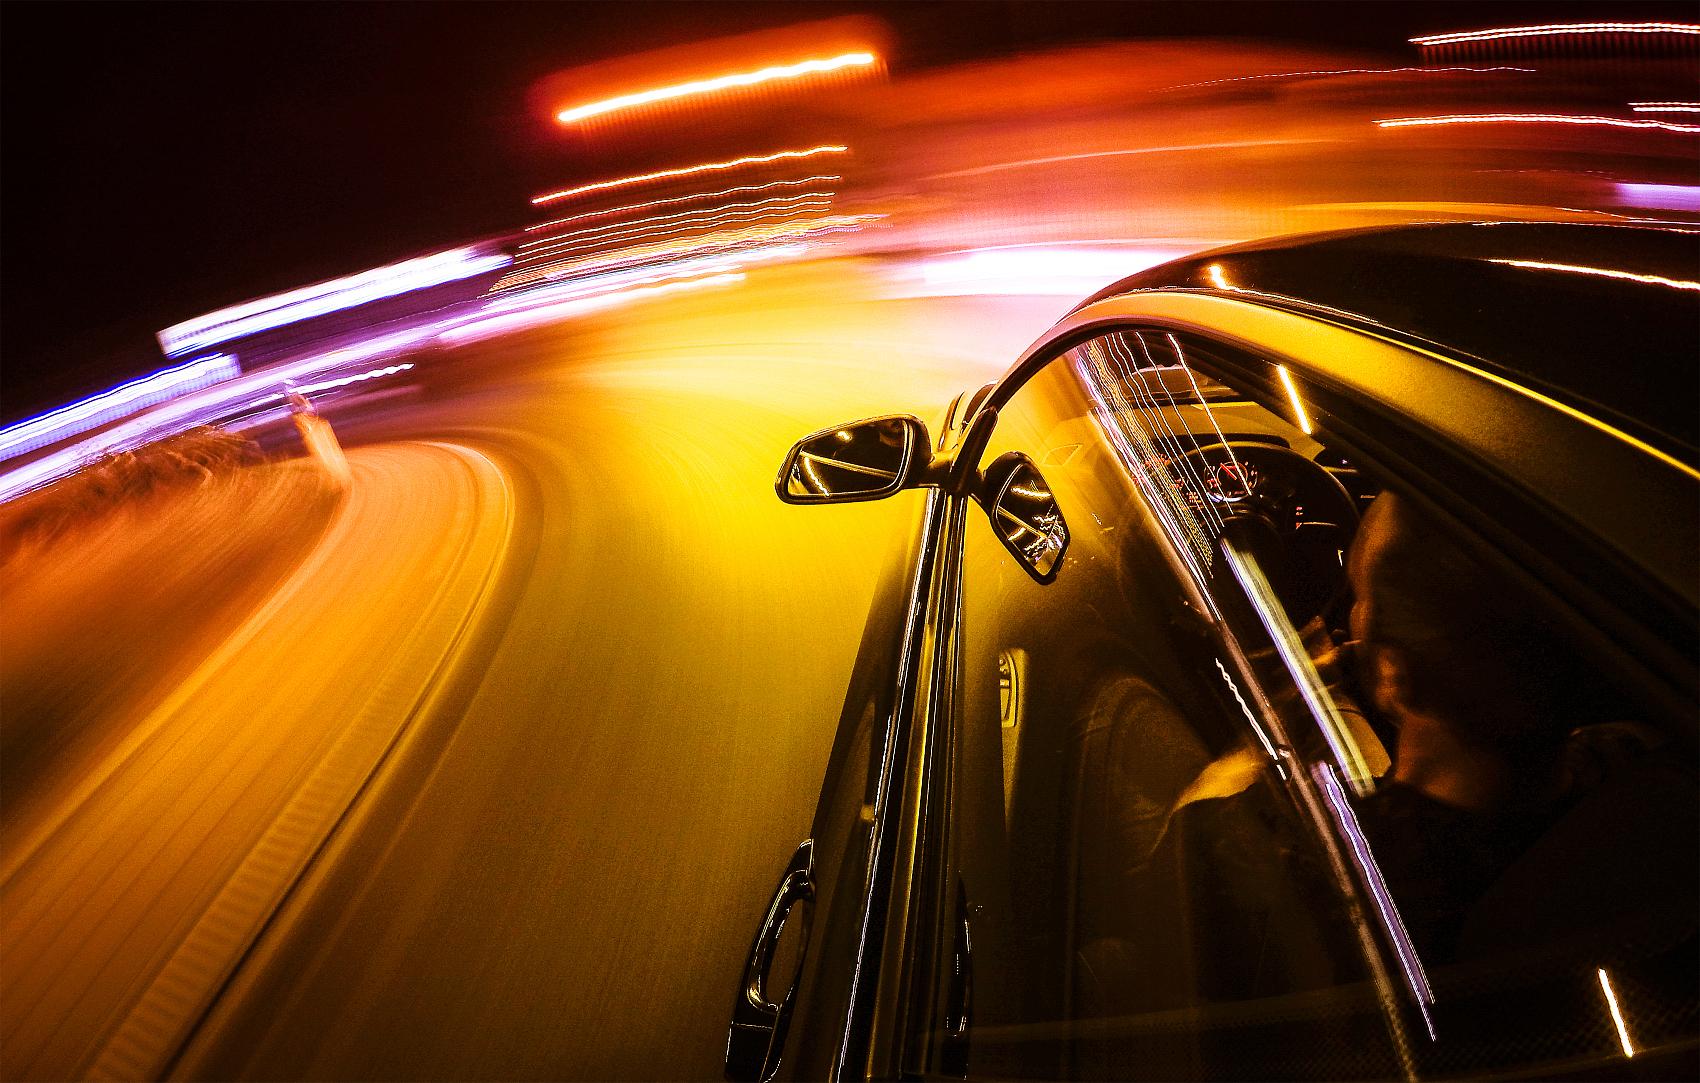 Baidu, Shouqi Limousine & Chauffeur to develop driverless cars